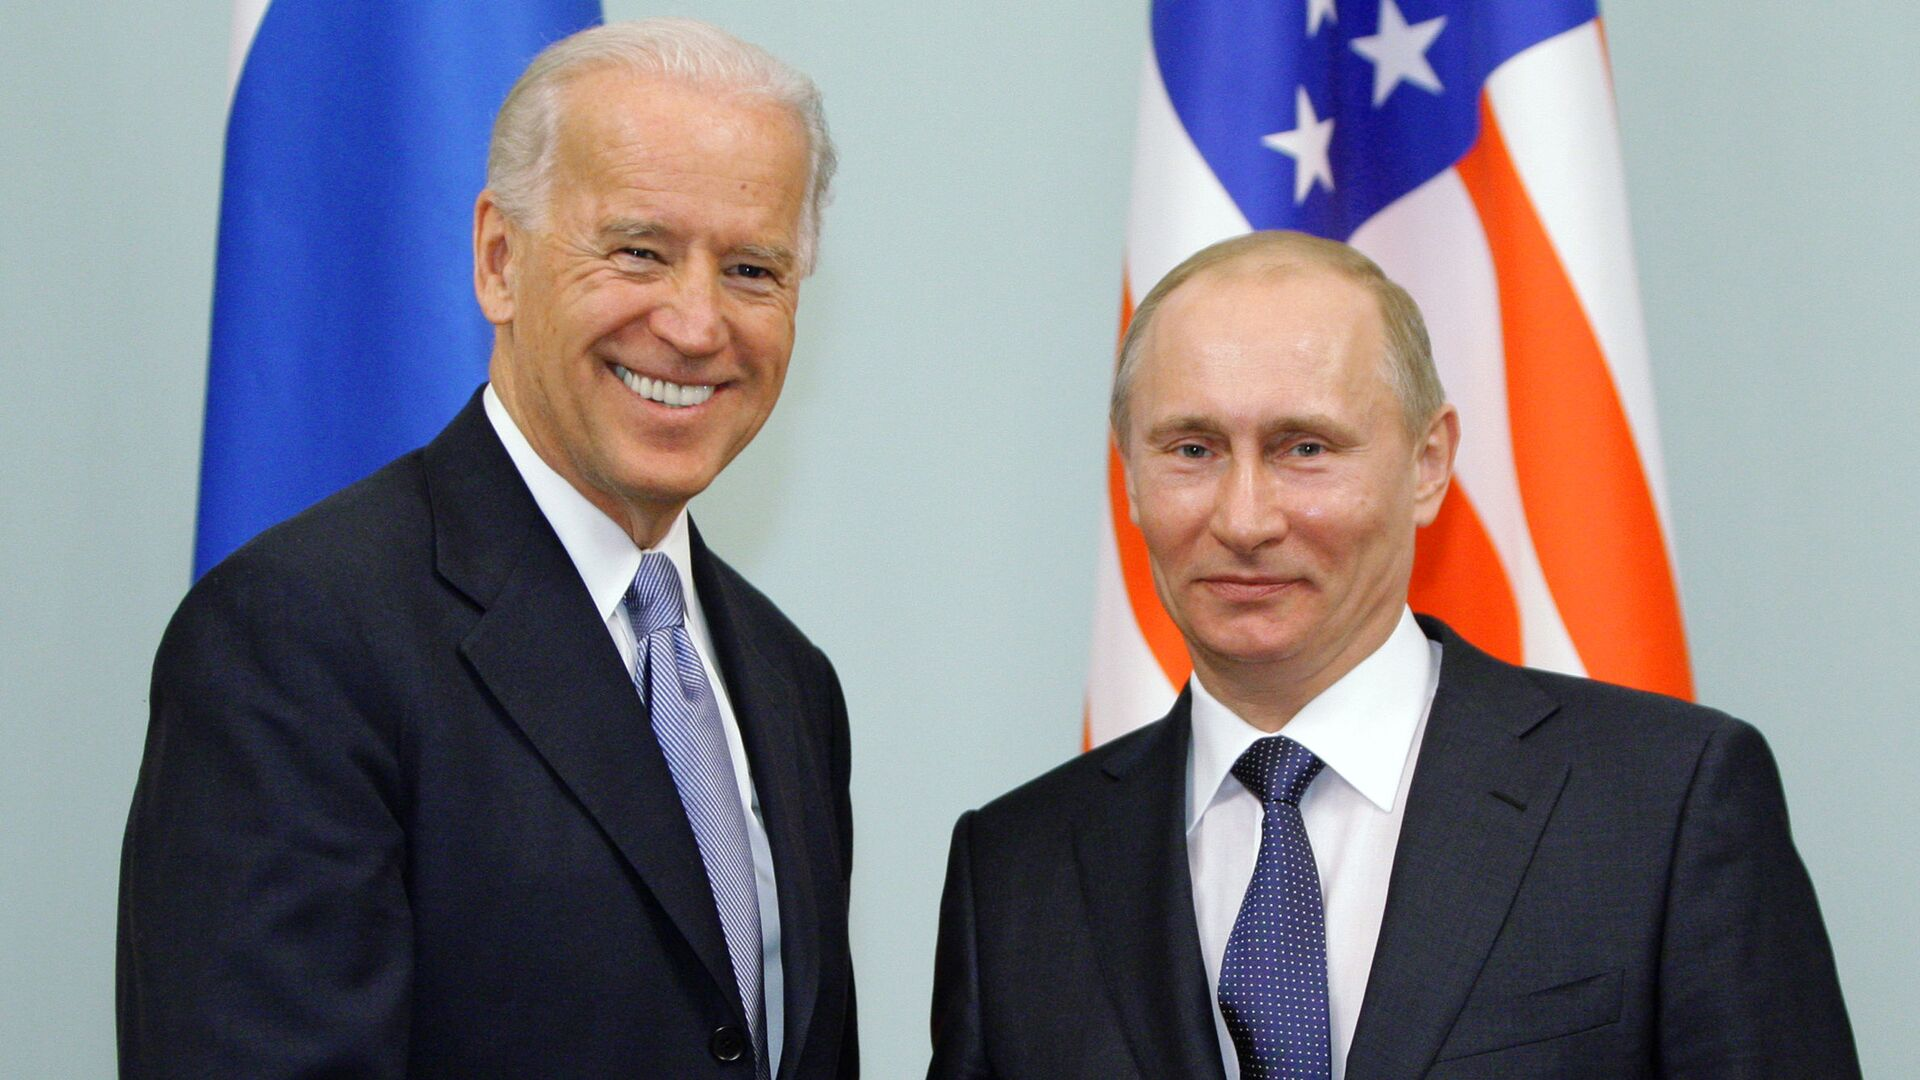 Президент РФ Владимир Путин и президент США Джо Байден - Sputnik Таджикистан, 1920, 15.06.2021